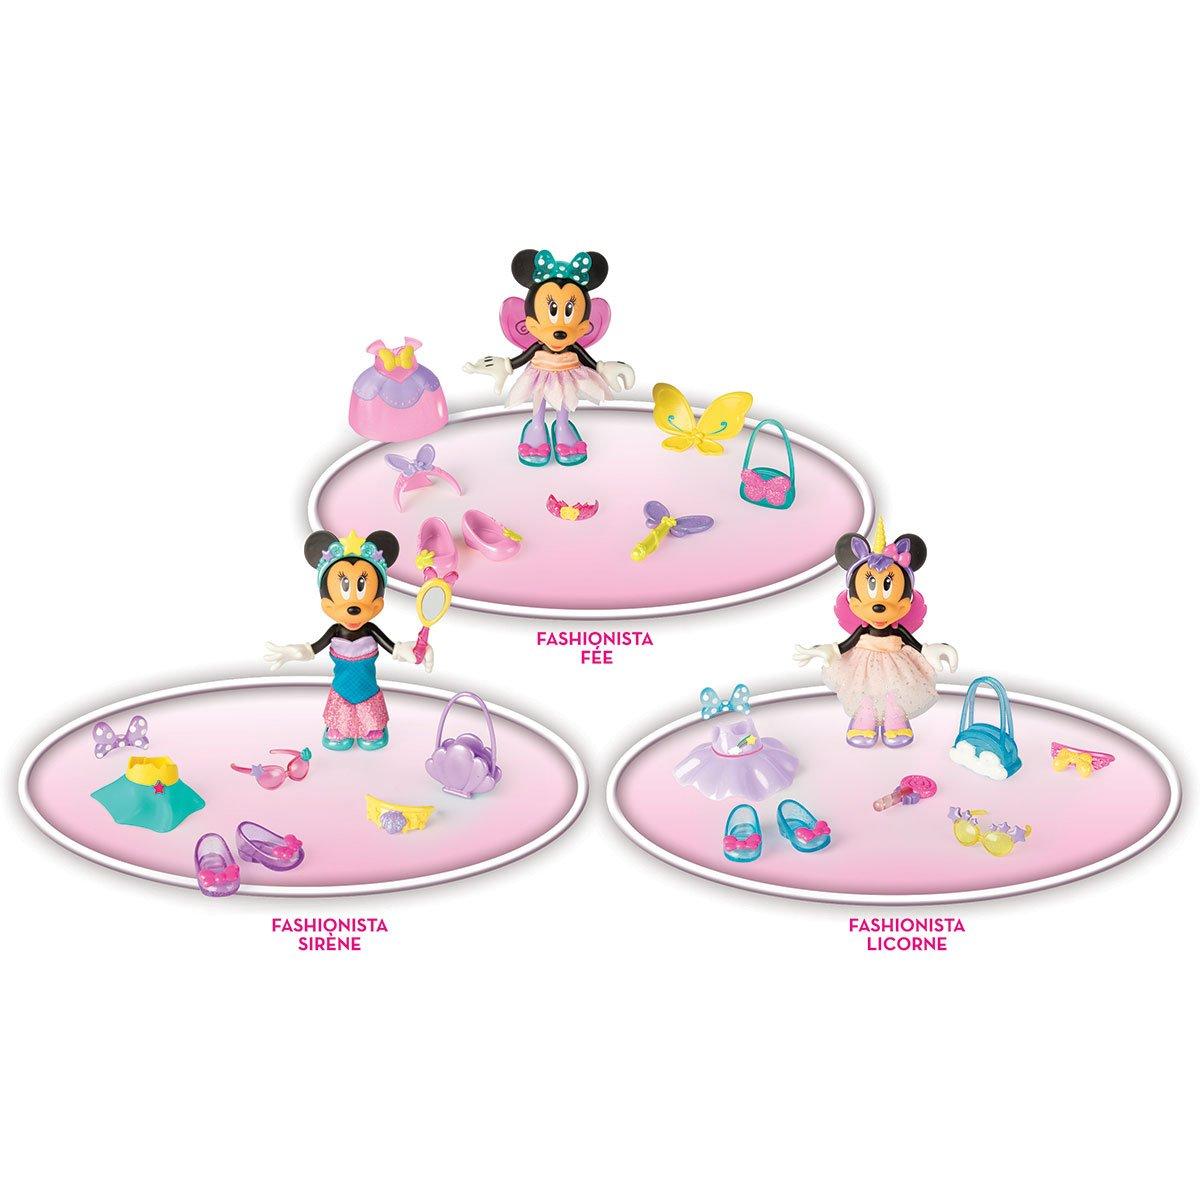 Figurine 15 Cm Minnie Fashionistas Fantaisies Licorne Sirene Ou